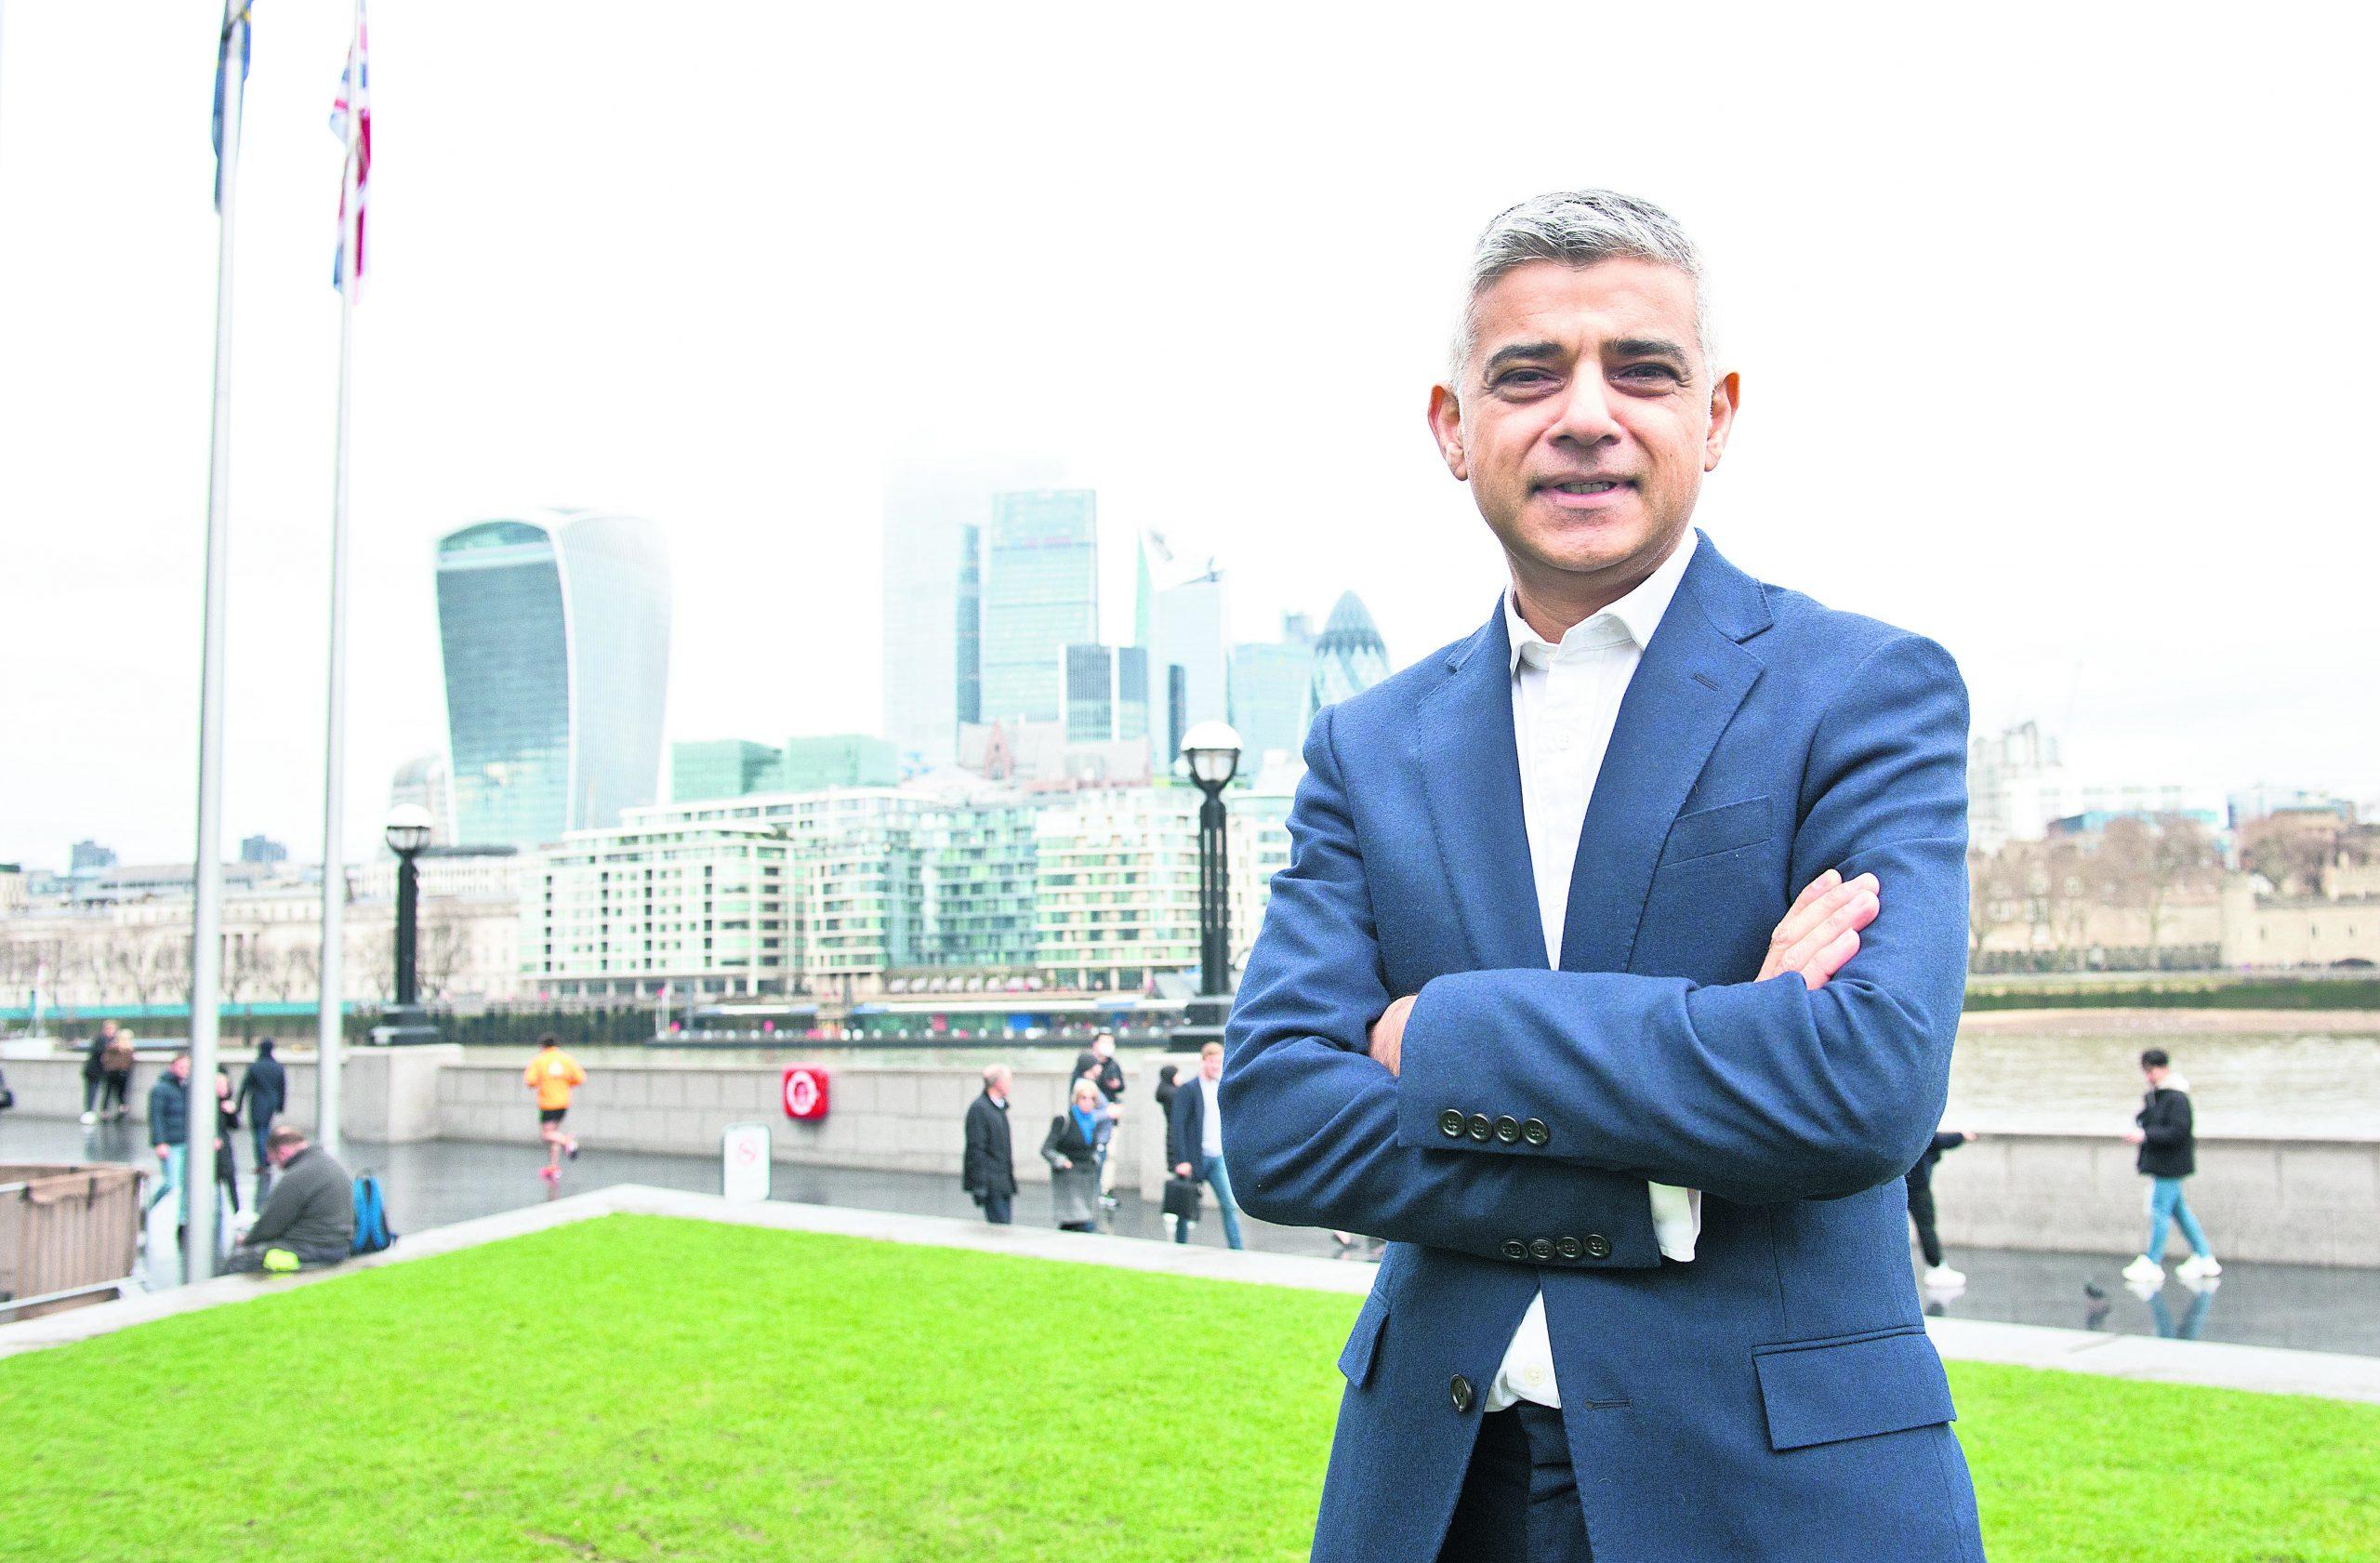 London mayor Sadiq Khan in front of the City of London skyline